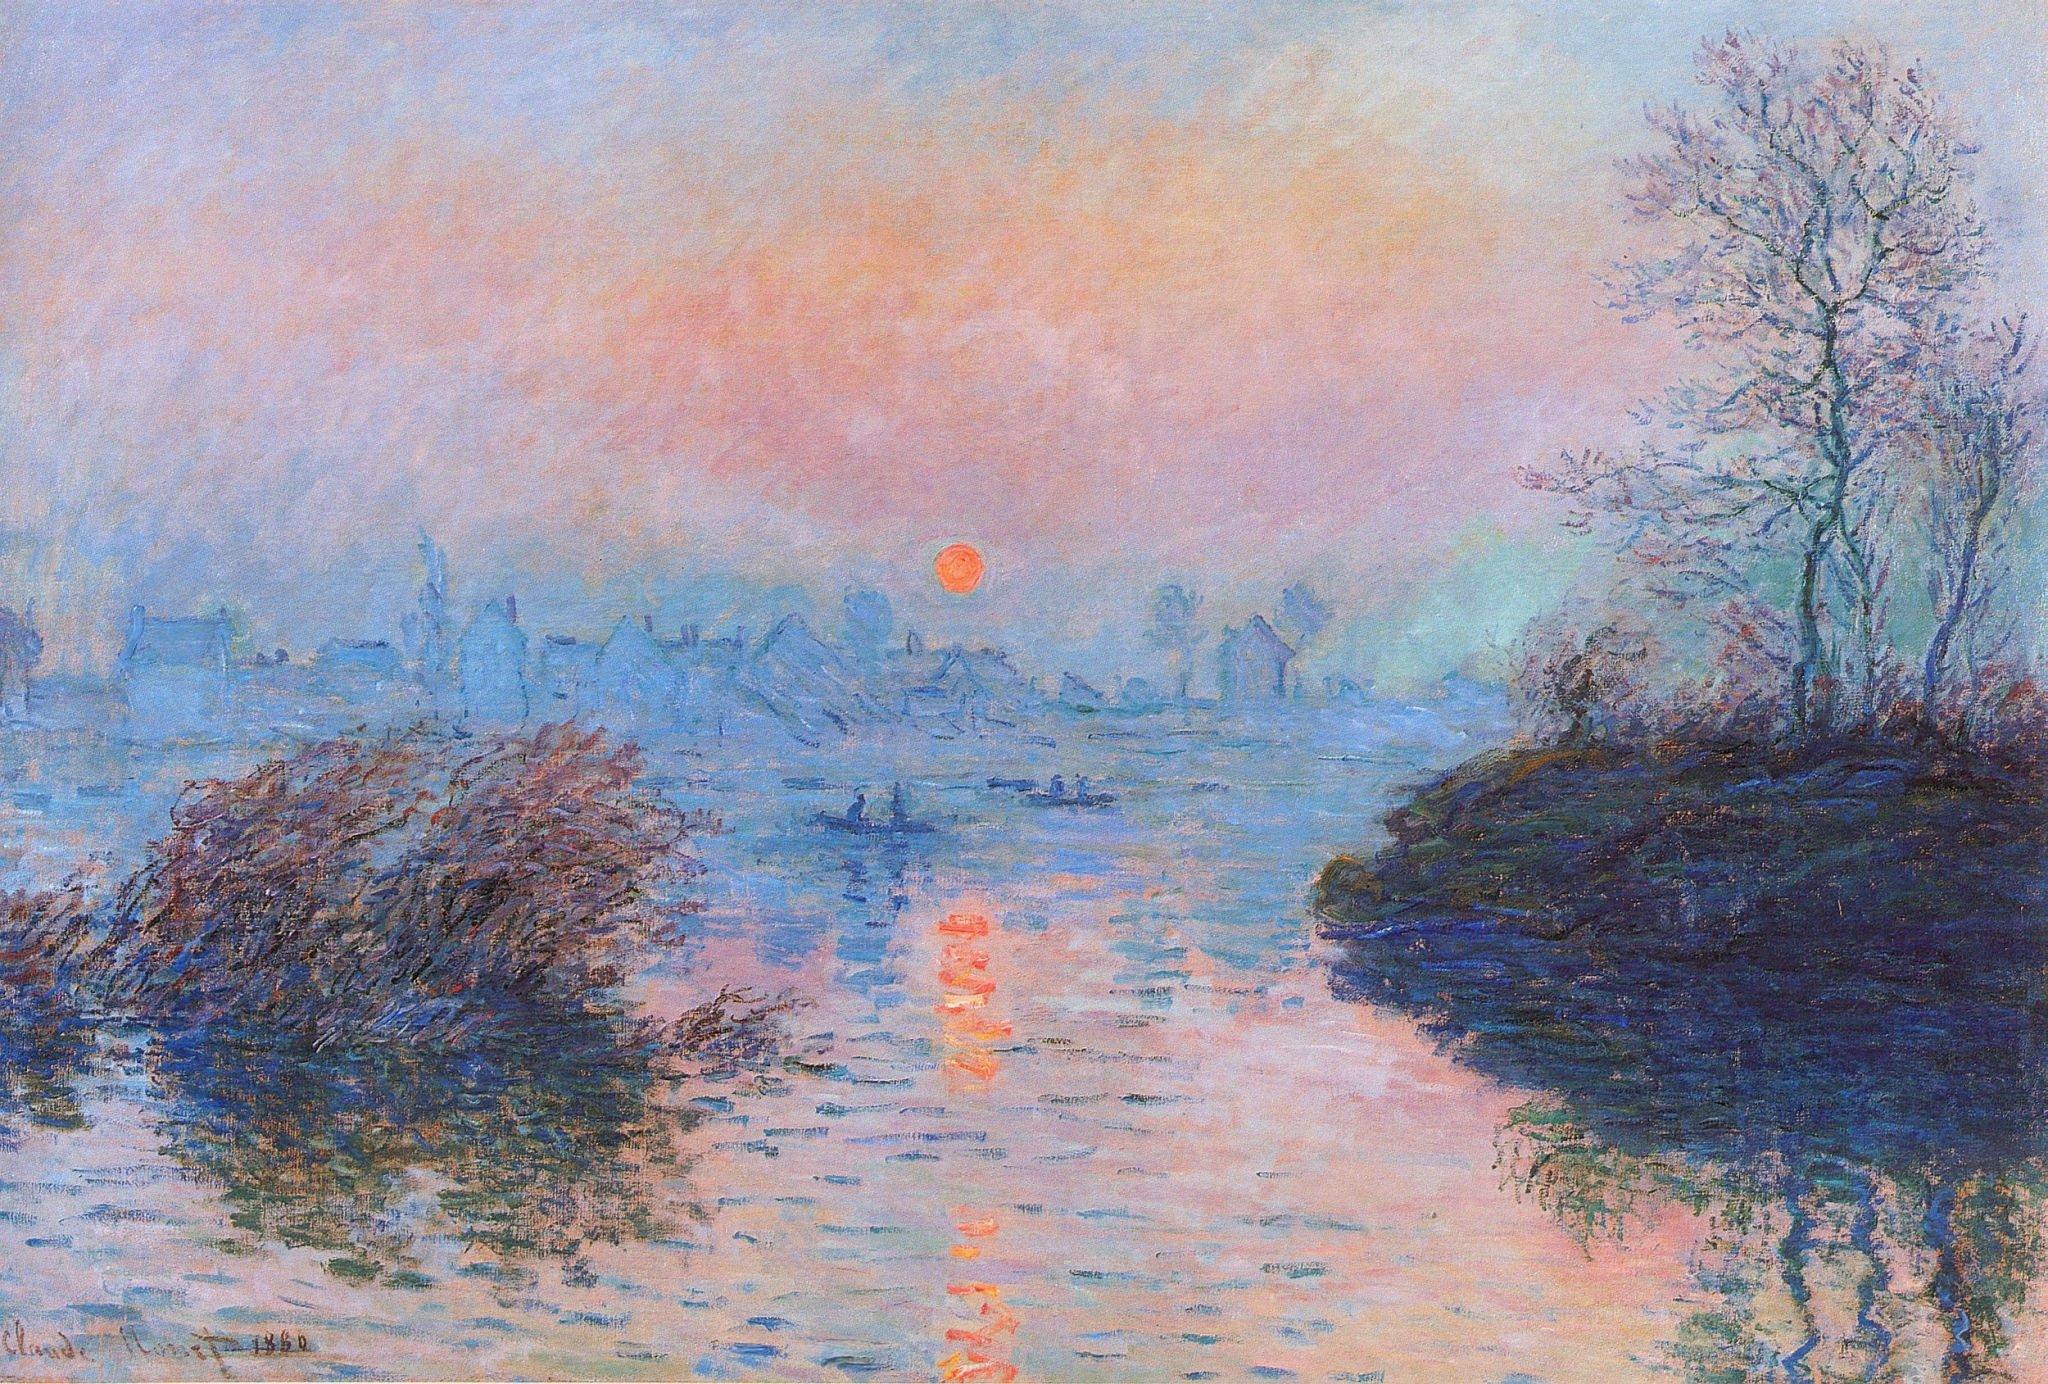 "Alessandro Fornero в Twitter: ""Claude #MONET, ""SUNSET AT LAVACOURT, WINTER  EFFECT"" 1880 #art #arttwit #twitart #twitart #iloveart #ilovemonet  #artlover… https://t.co/FVlTUAFdKo"""